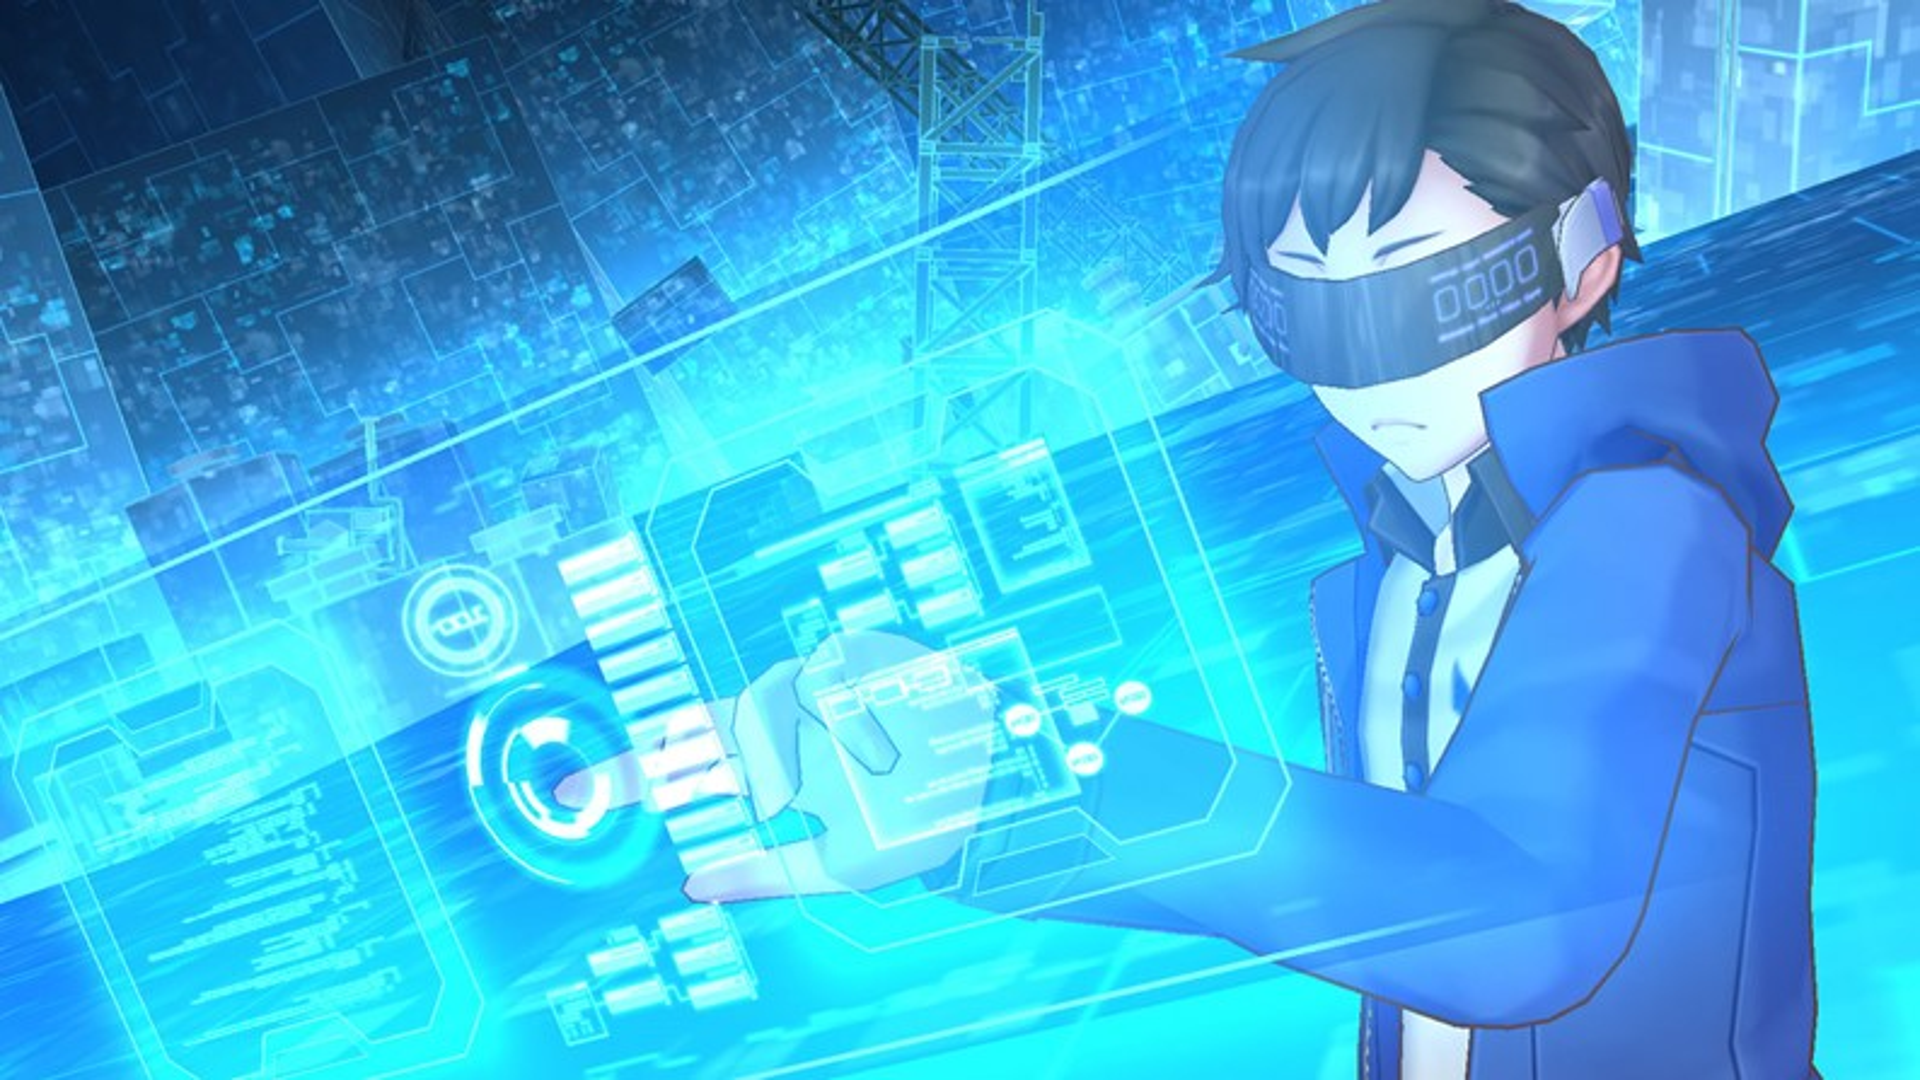 Bandai Namco anuncia Digimon Story: Cyber Sleuth Hacker's Memory